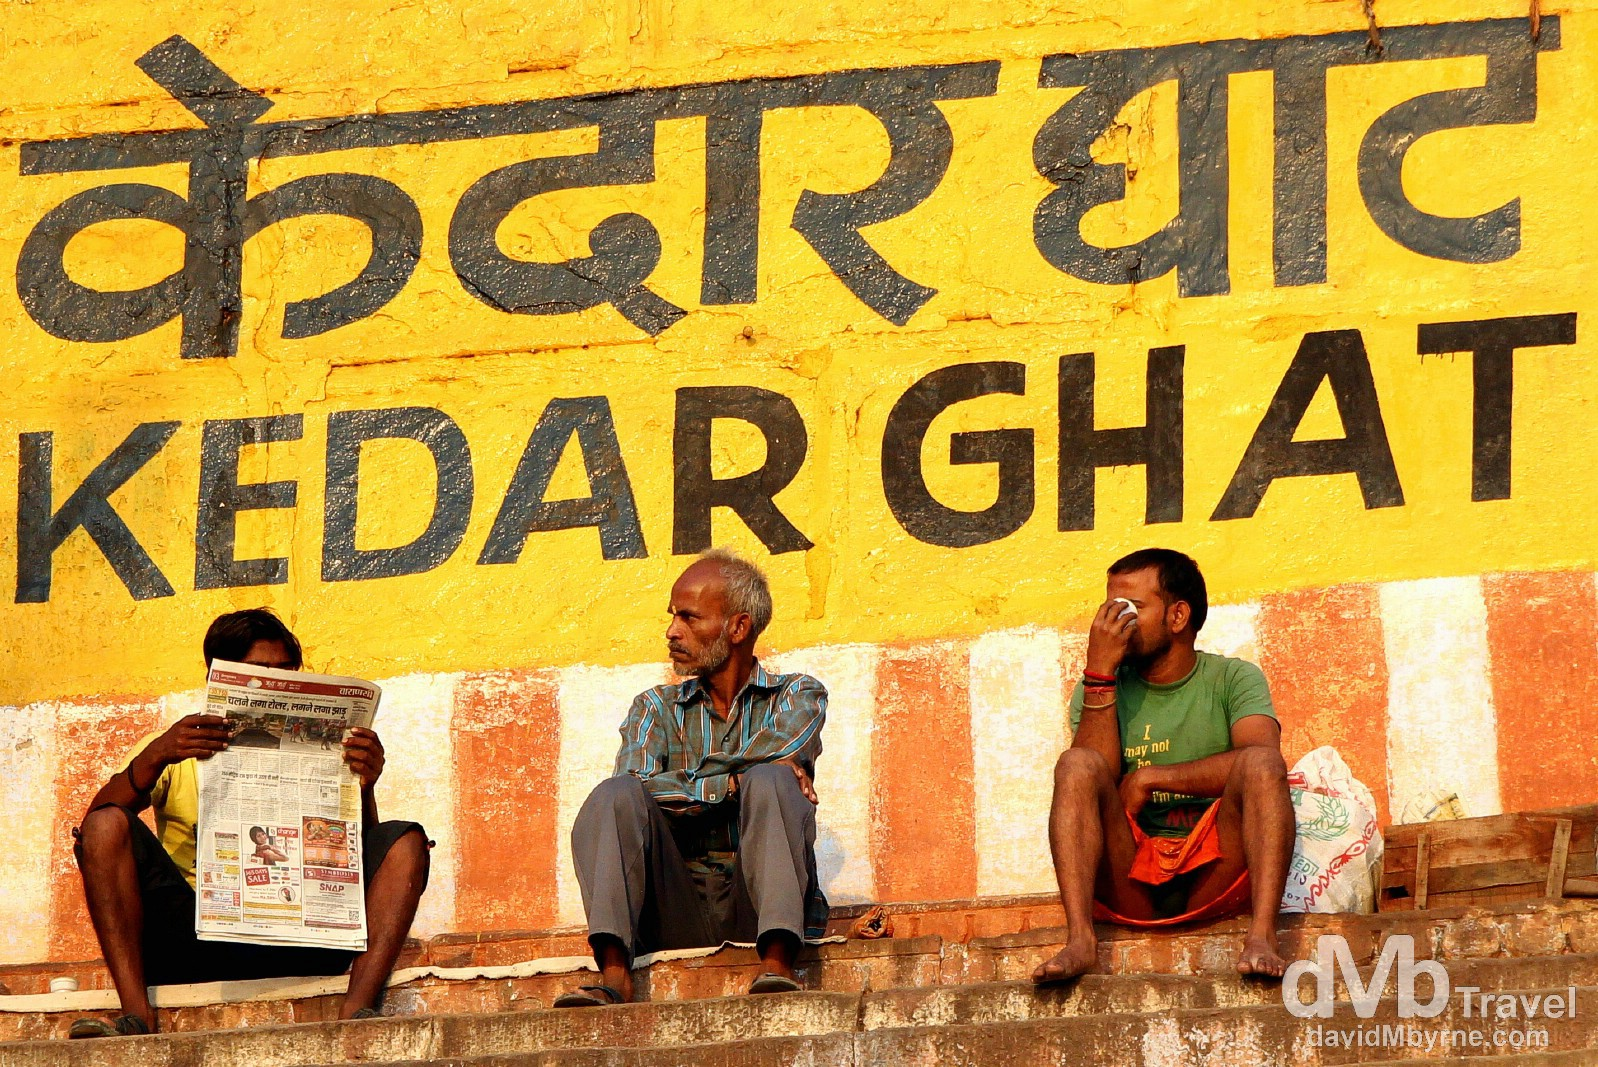 Sitting by the Kedar Ghat by the River Ganges in Varanasi, Uttar Pradesh, India. October 14th 2012.